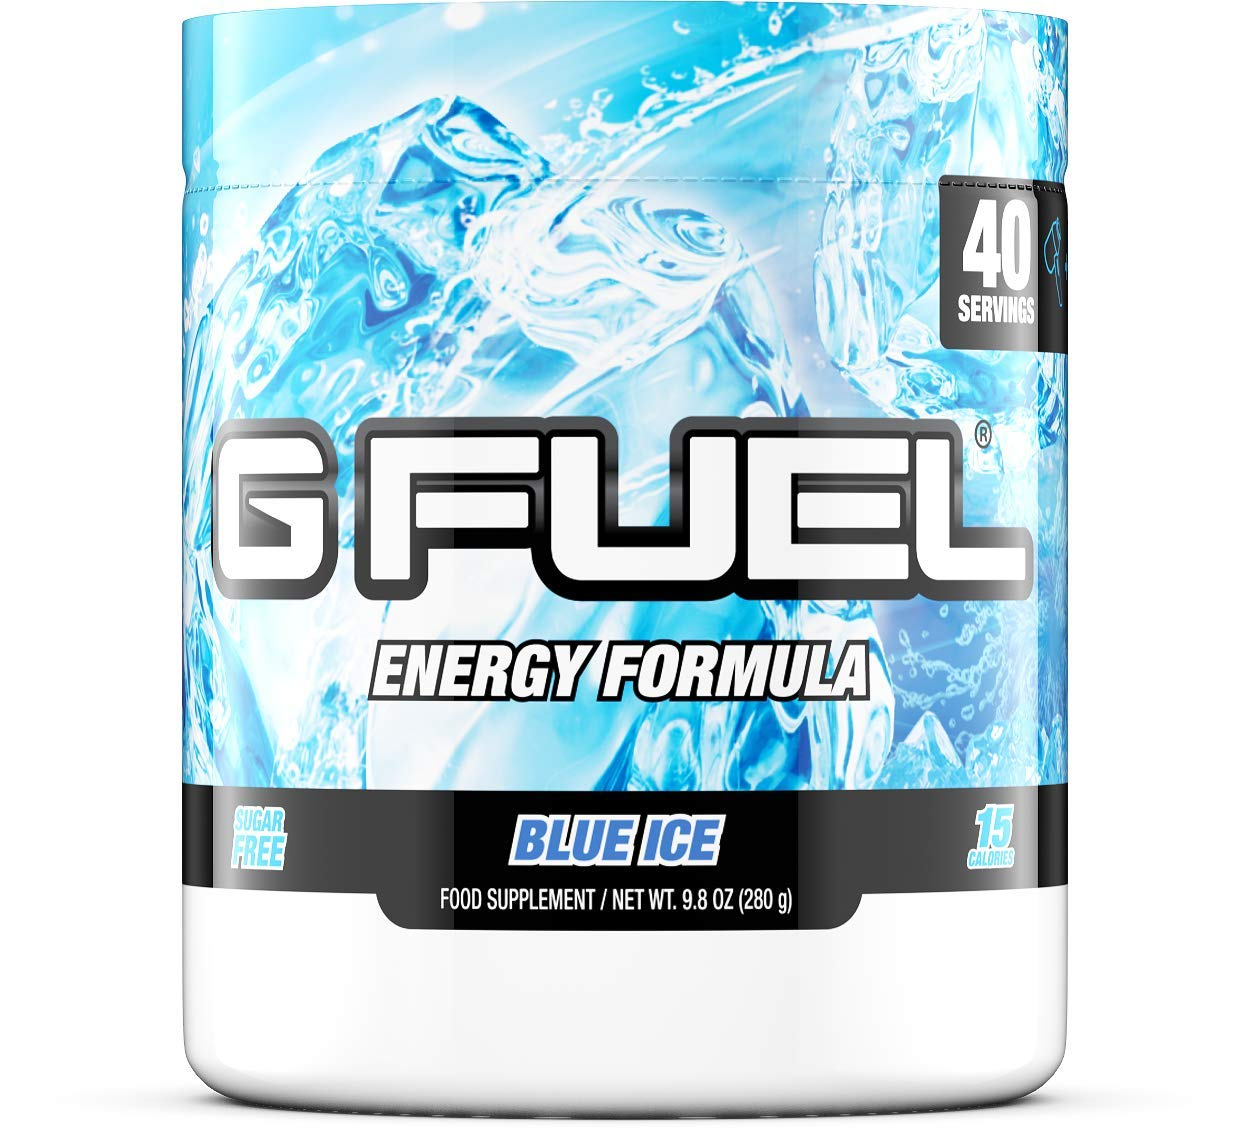 G Fuel Blue Ice Tub (40 Servings) Elite Energy and Endurance Eu Formula